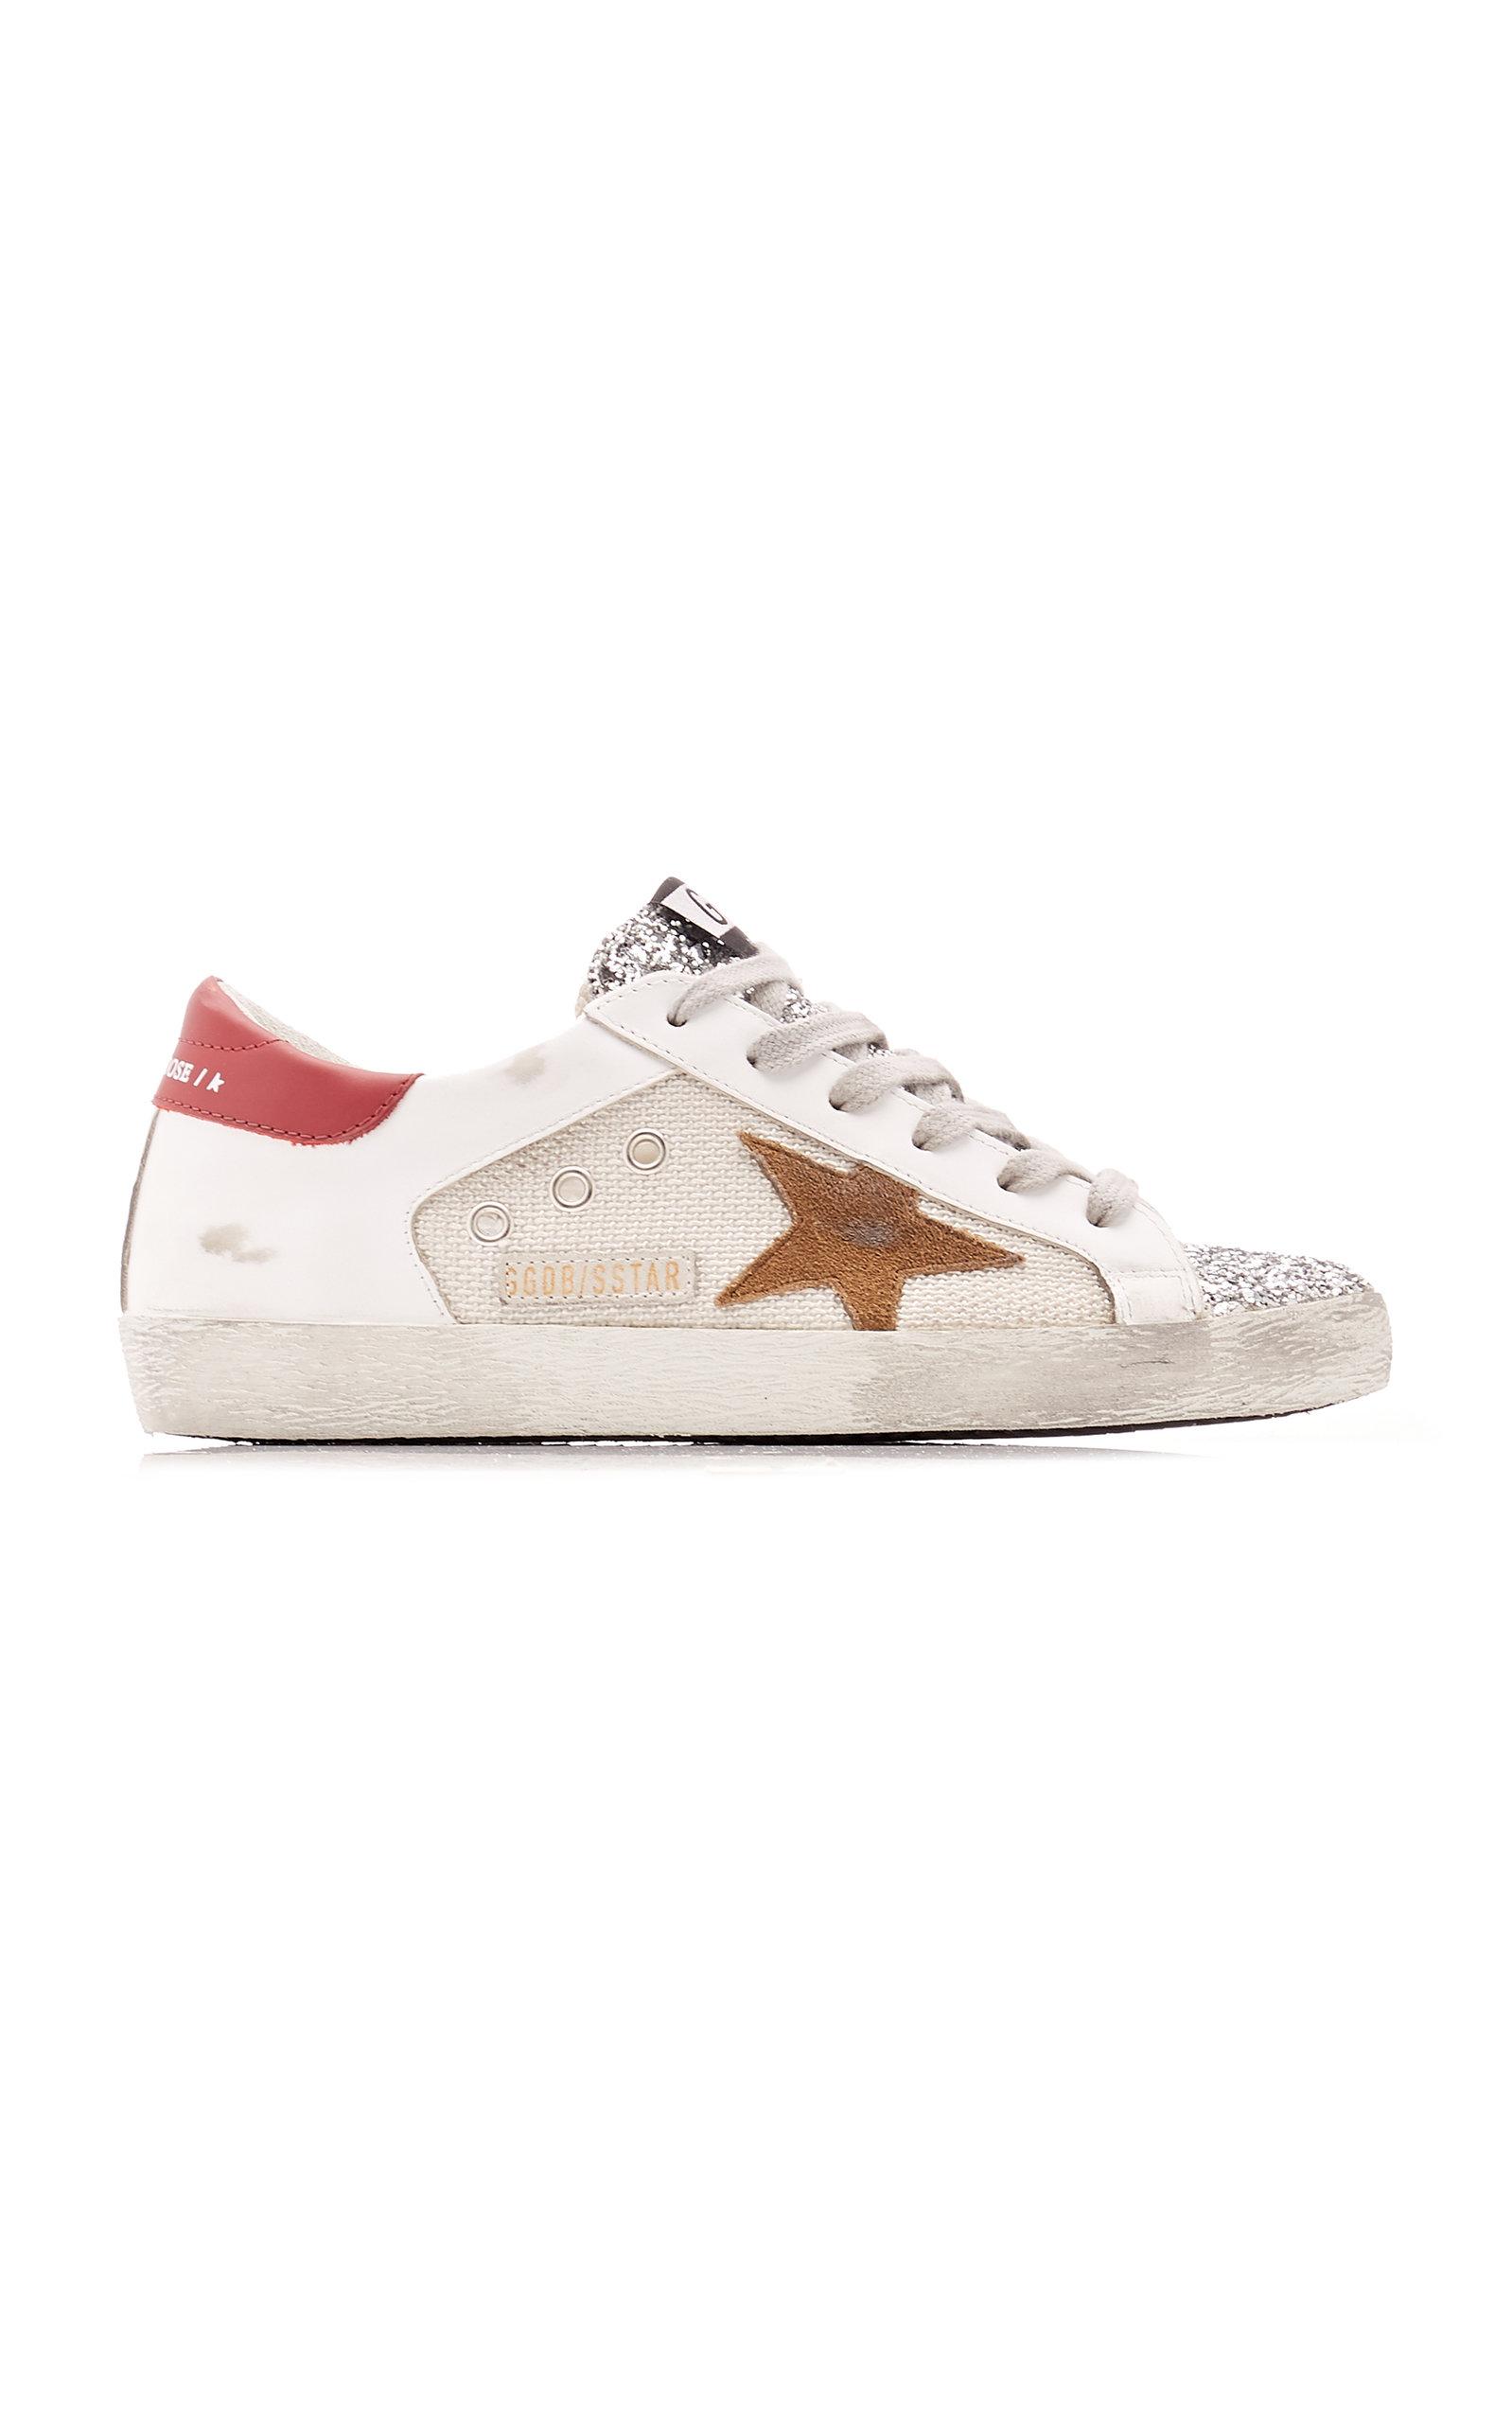 Golden Goose - Women's Superstar Net Sneakers - Multi - Moda Operandi